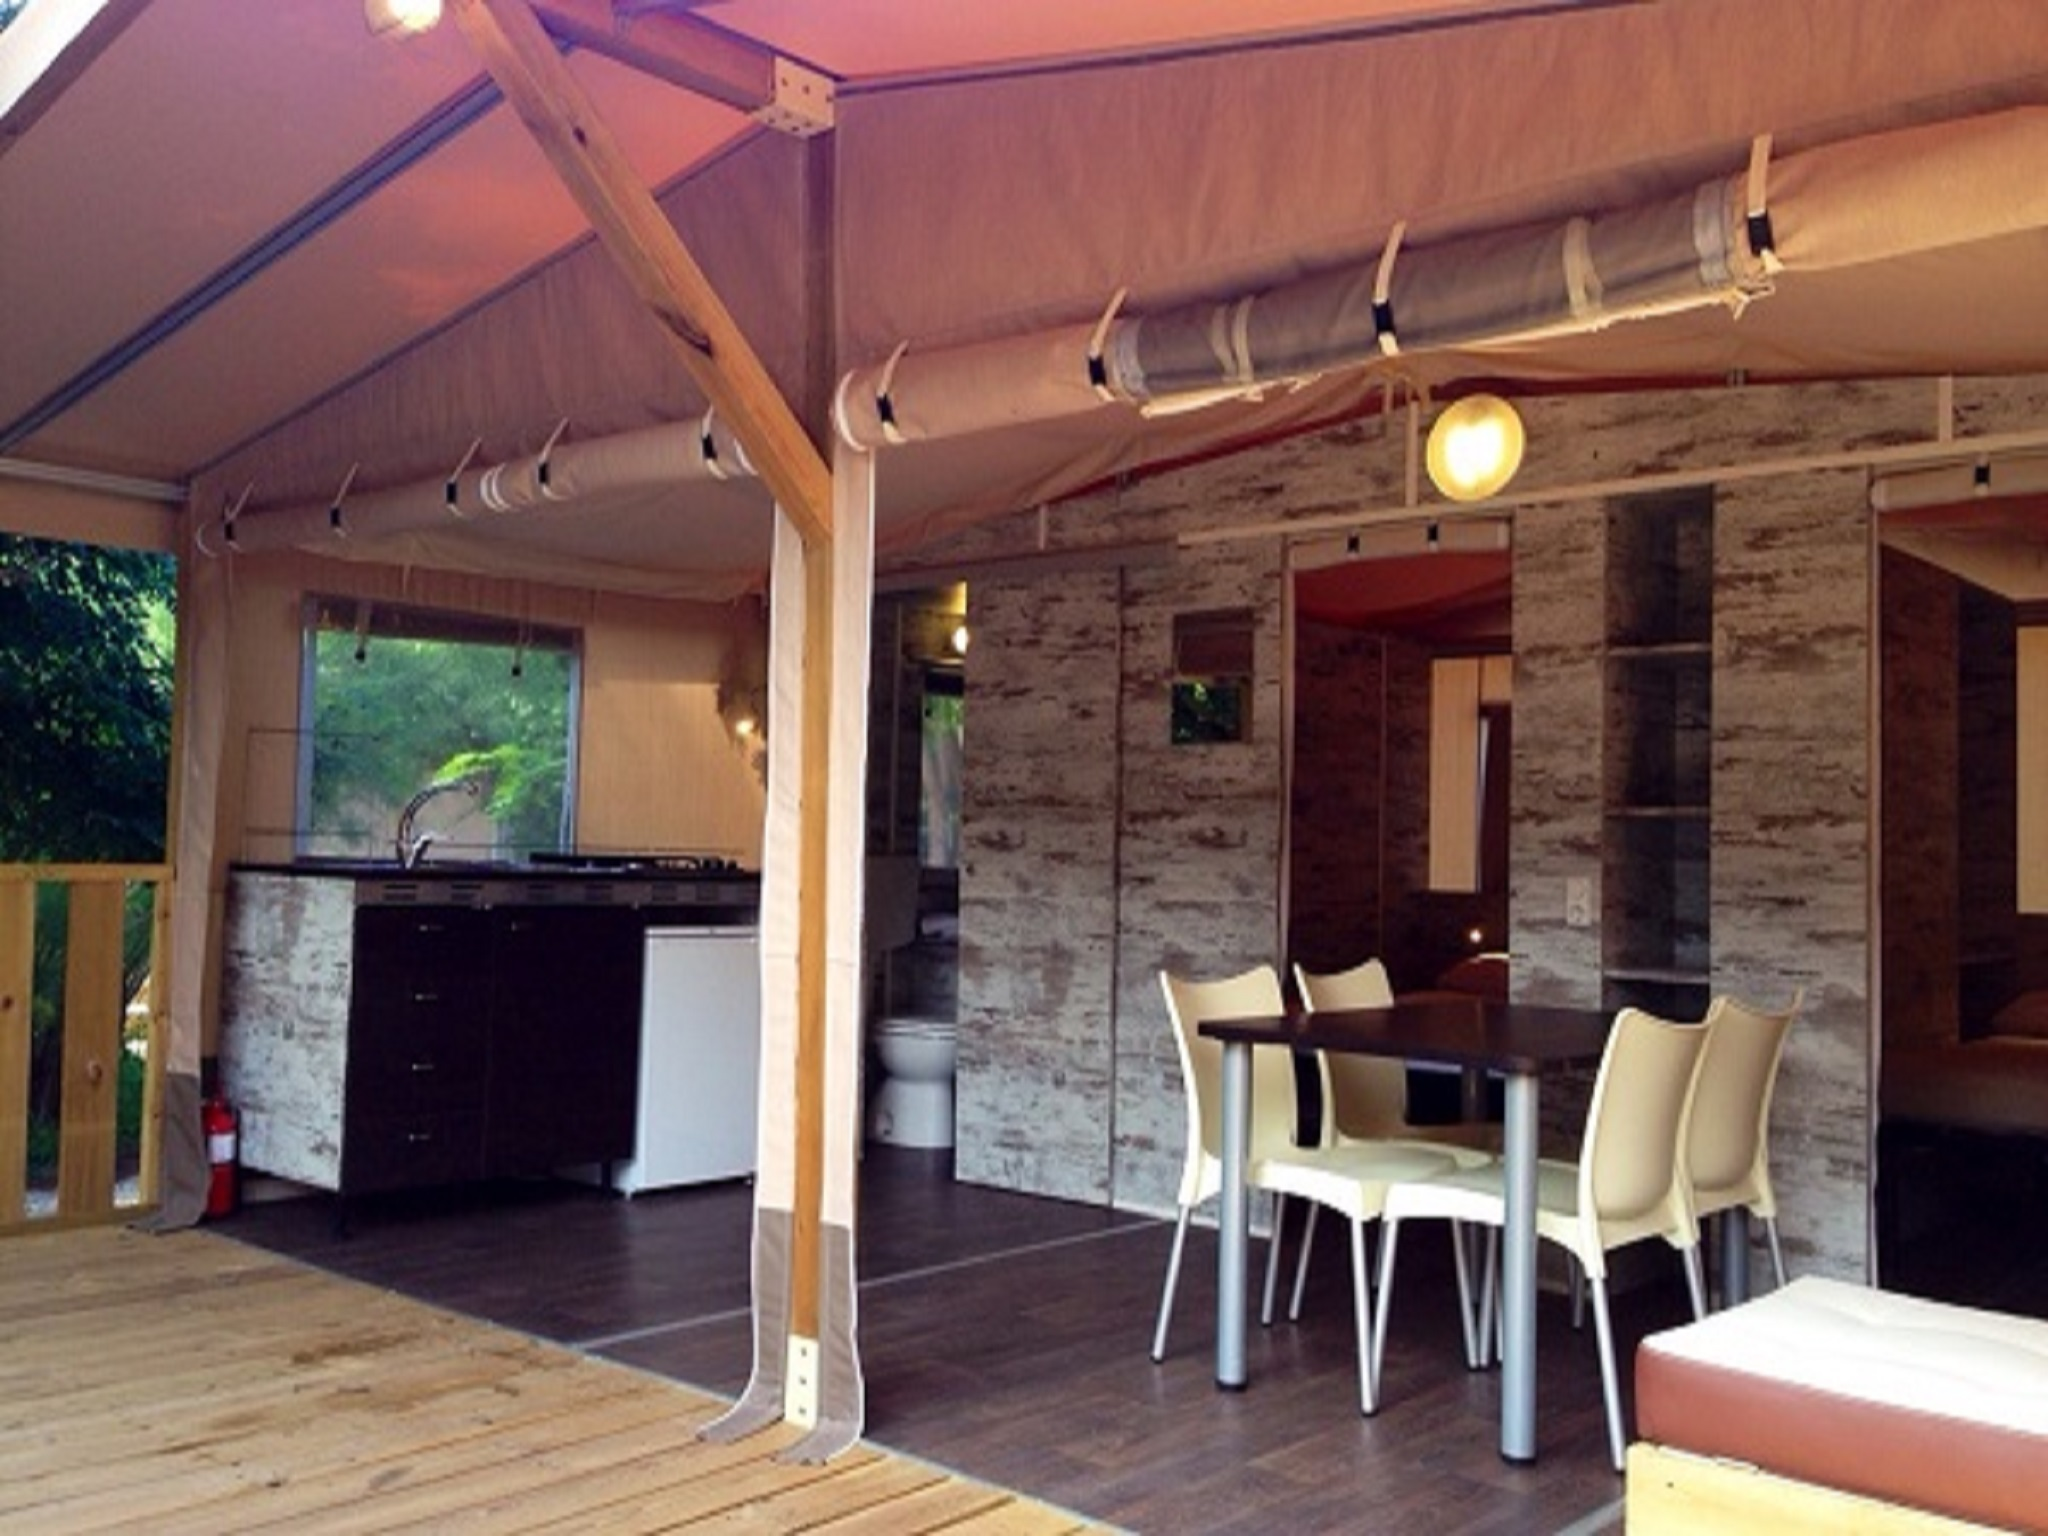 Safari Lodge Tent - Maremma Sans Souci